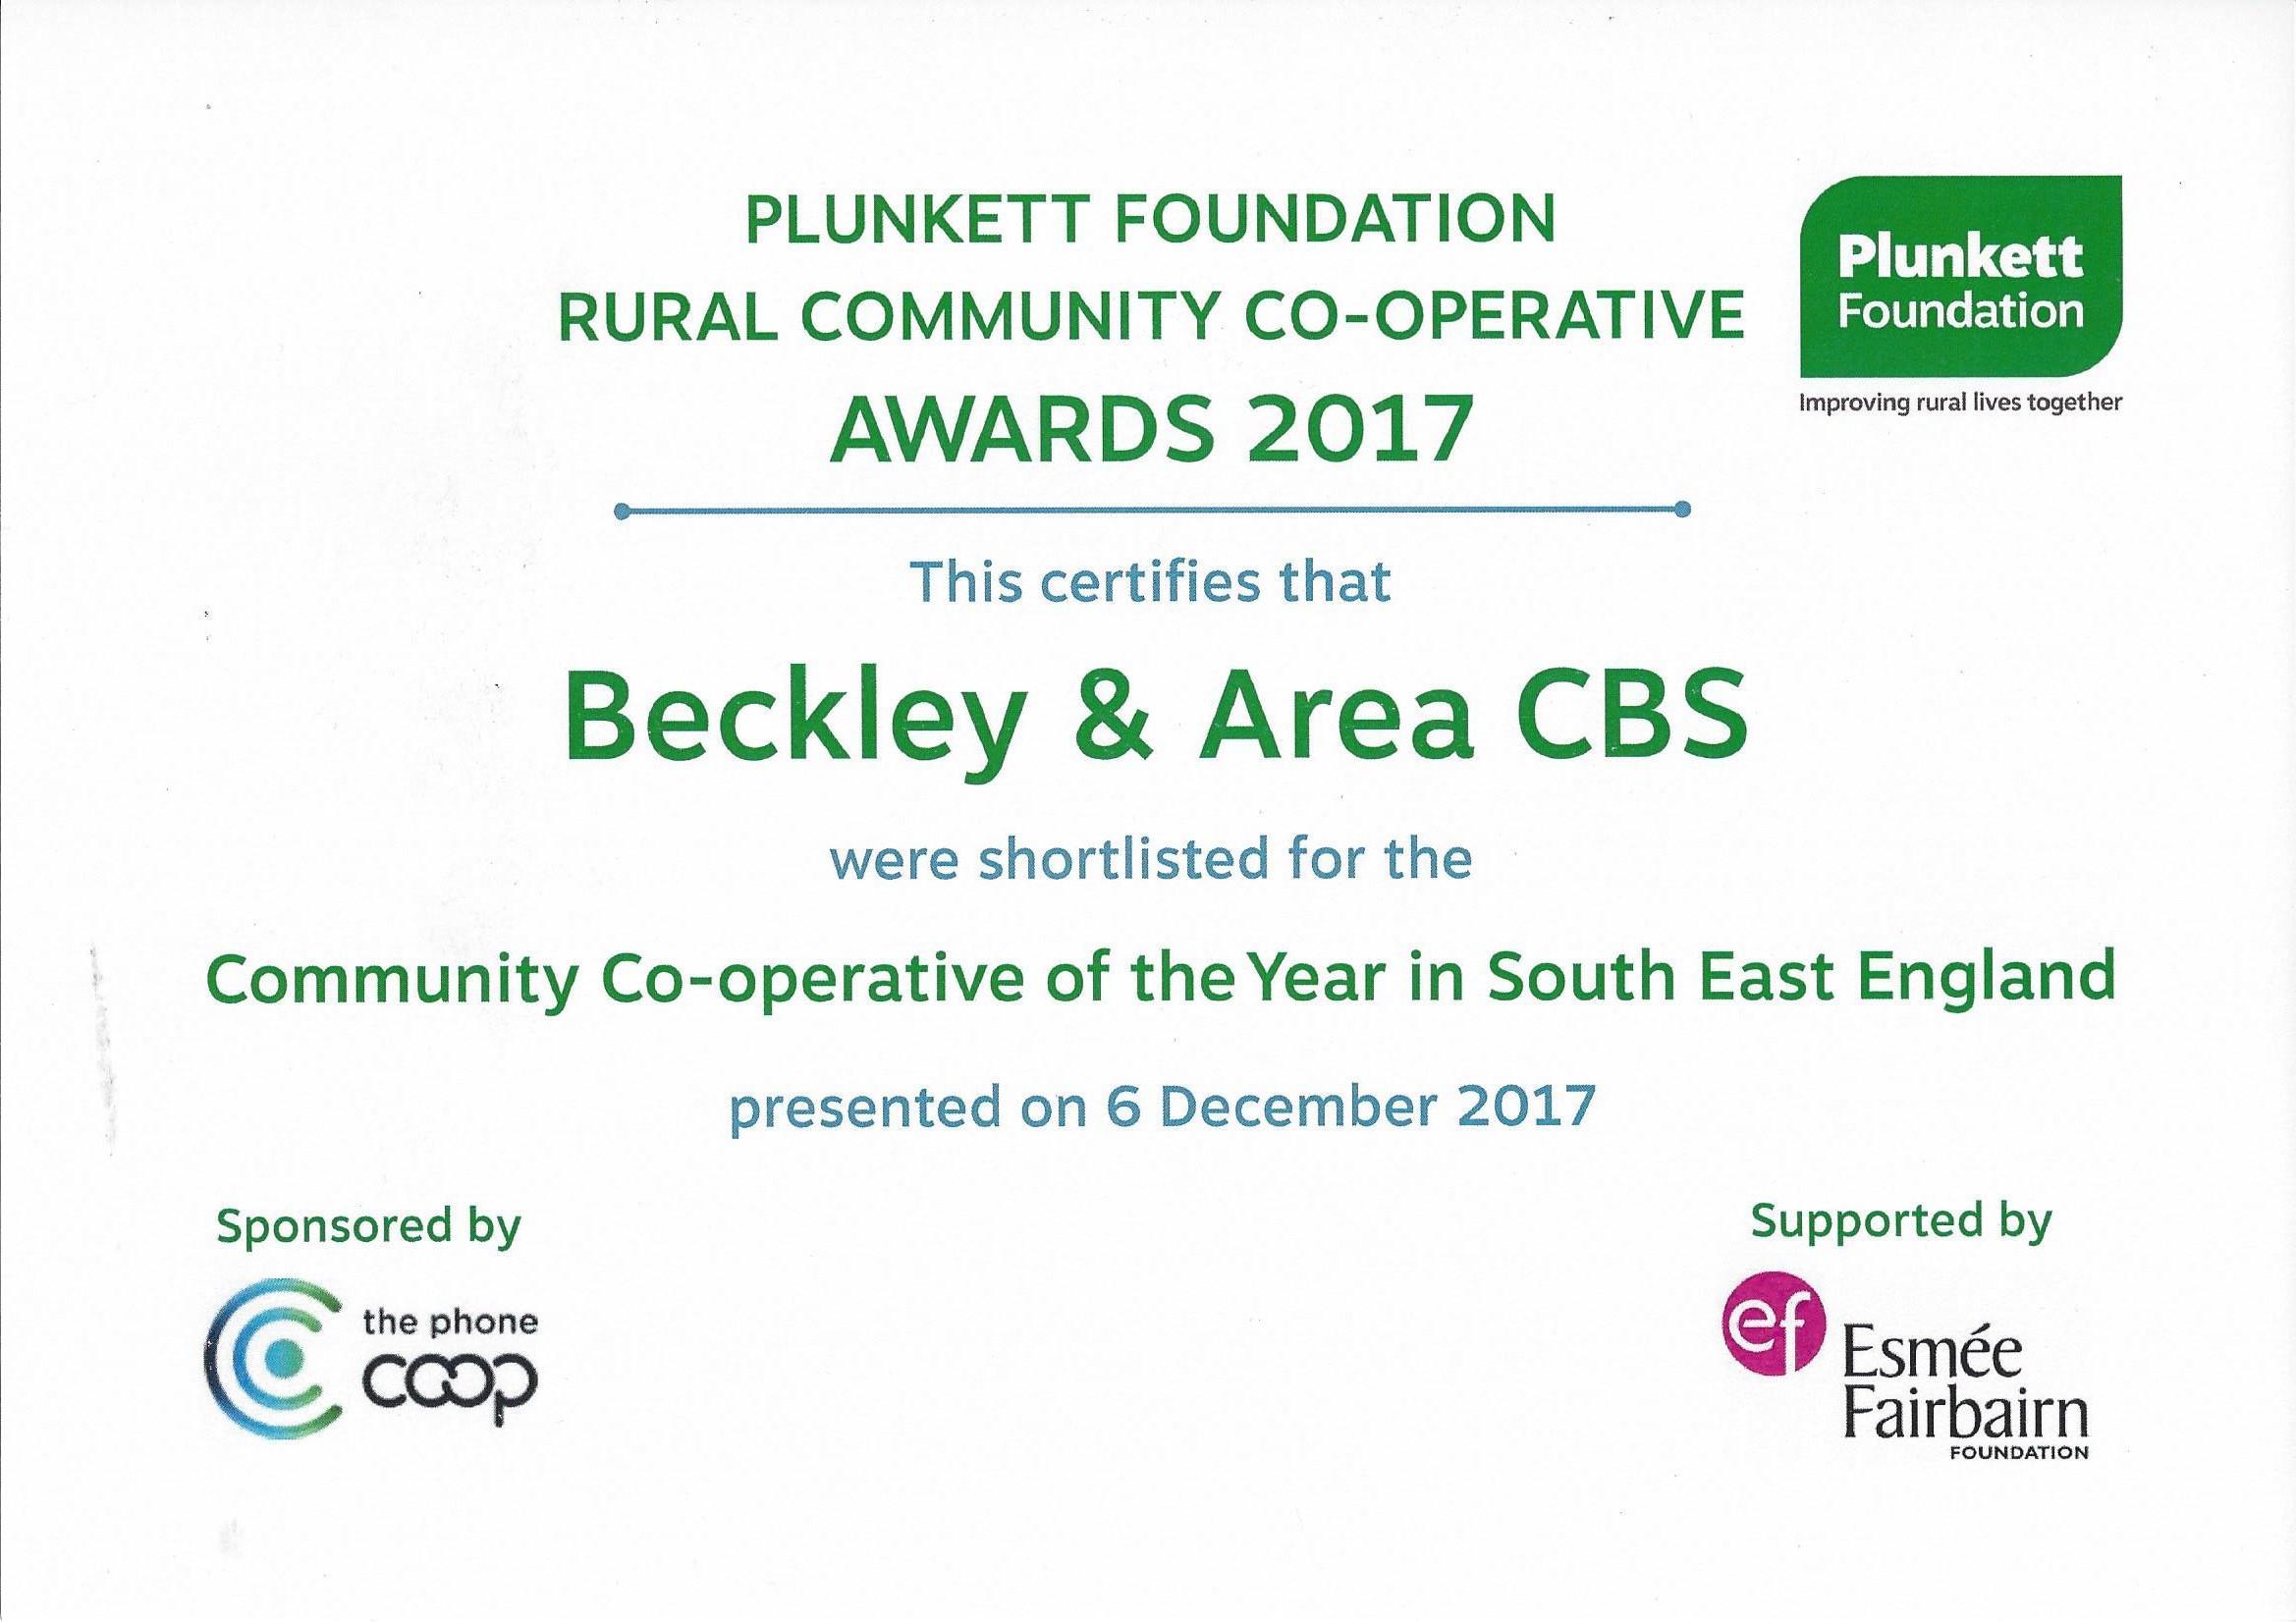 Plunkett Foundation Rural Community Co-Operative Awards 2017 Certificate.jpg